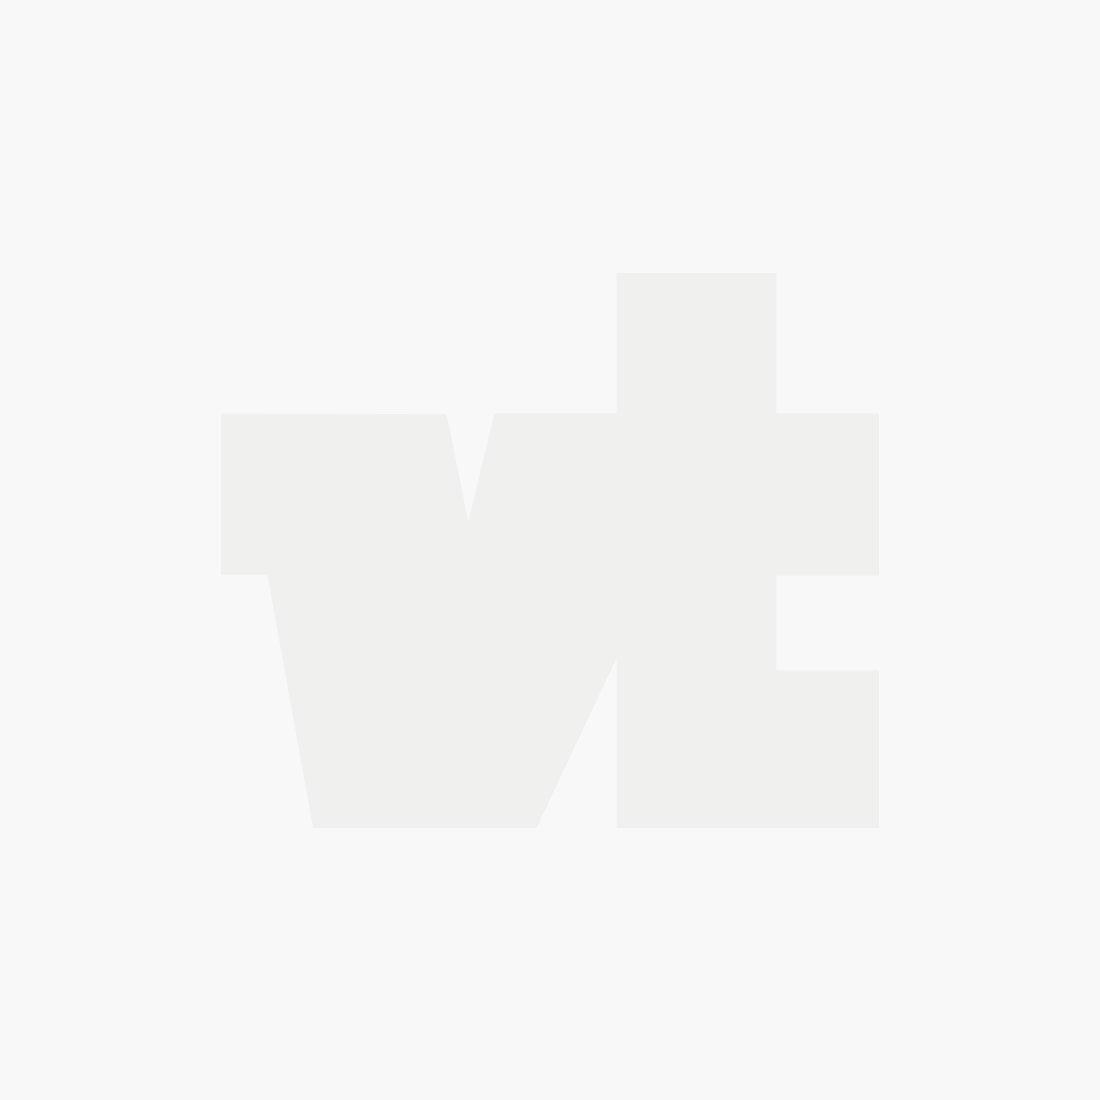 Vibbe ss belt denim dress dark blue